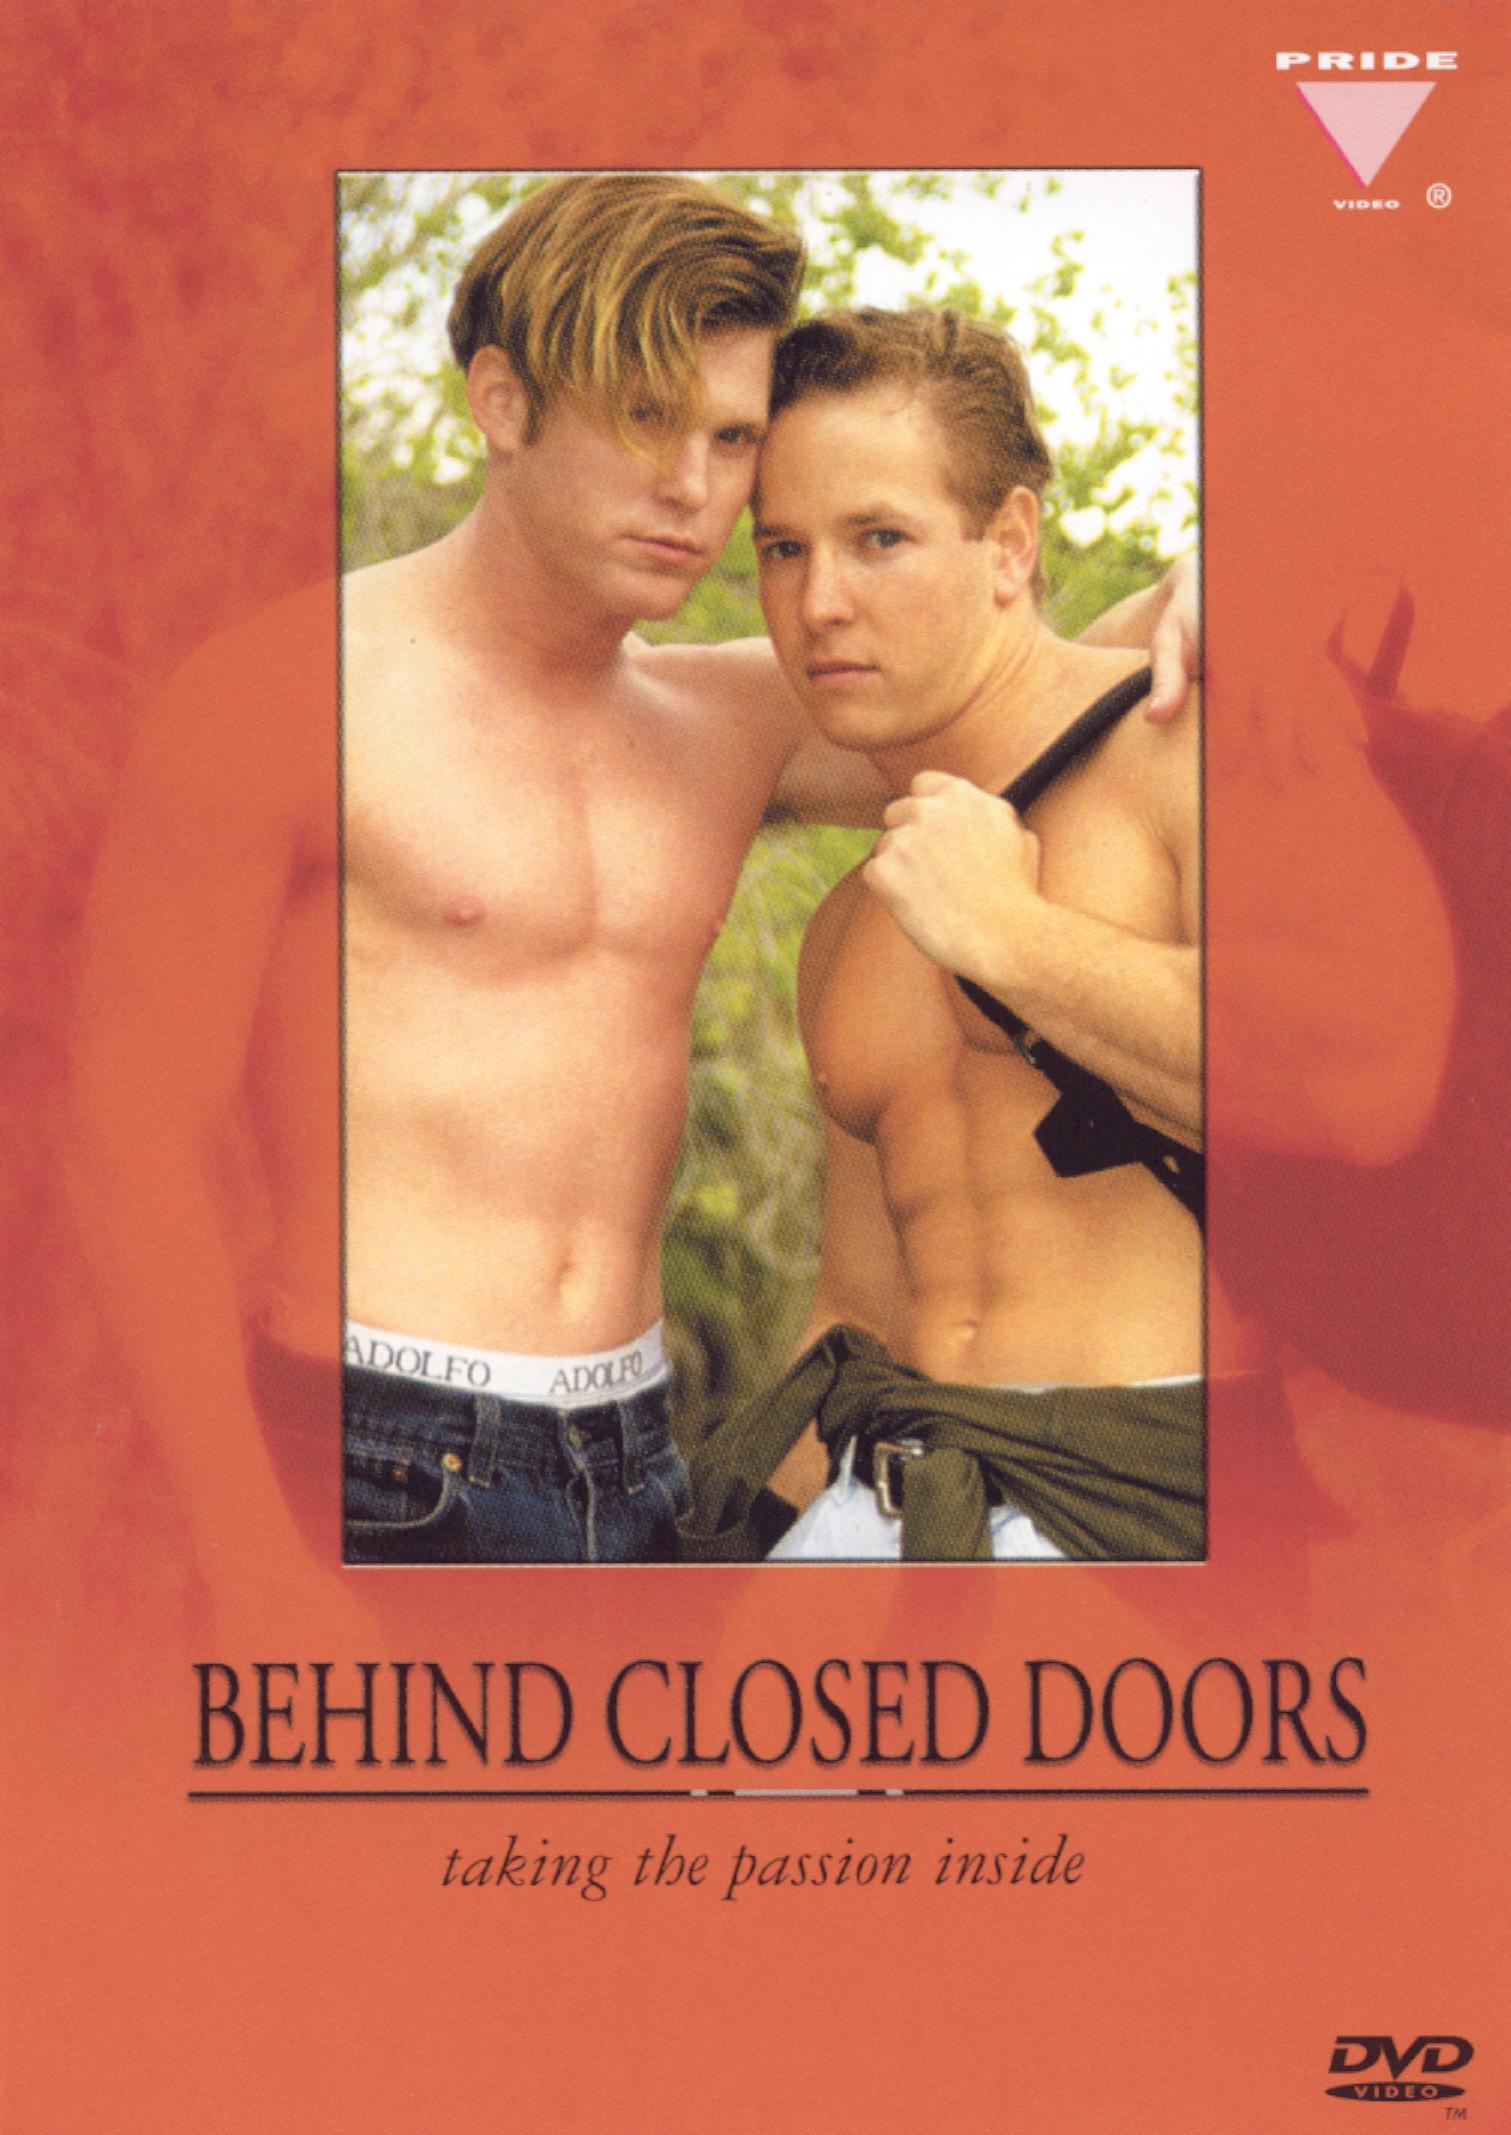 behind closed doors 2003 synopsis characteristics